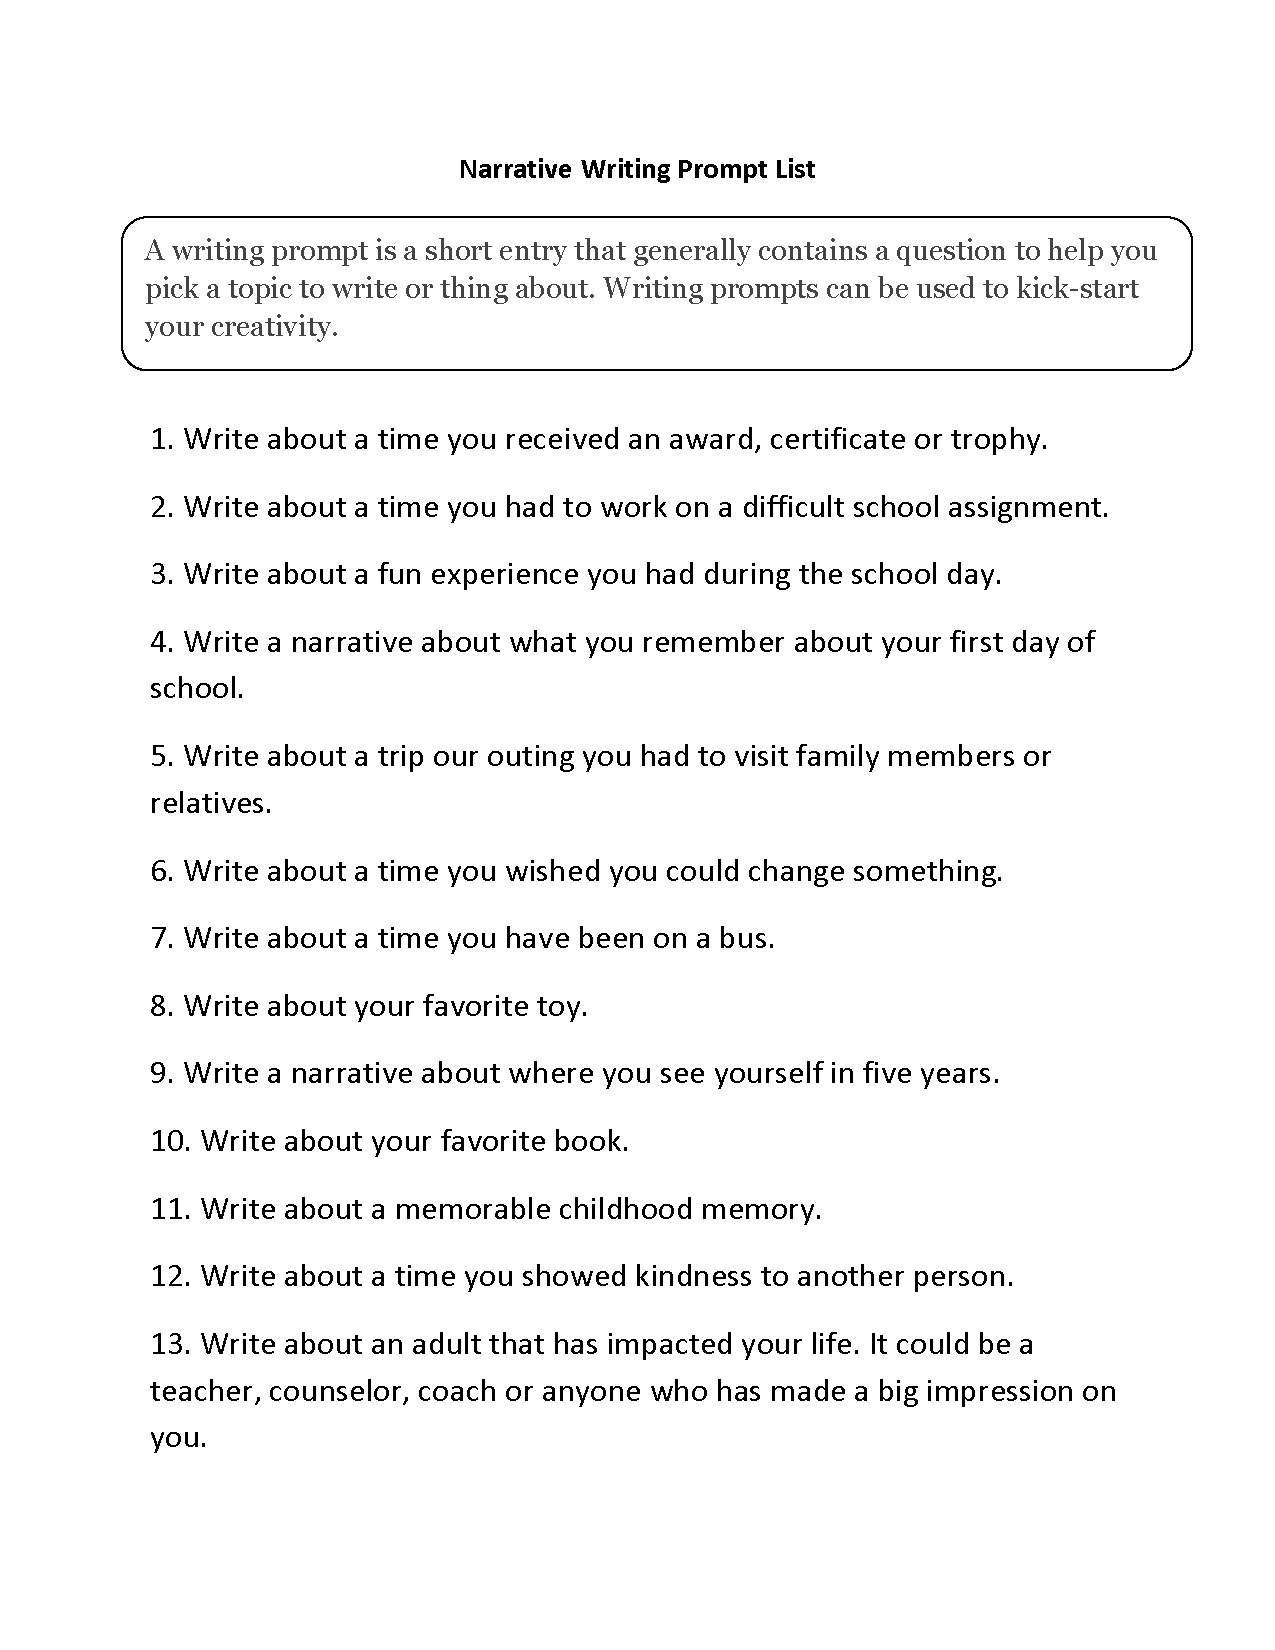 worksheet Narrative Writing Worksheets narrative writing prompt list and worksheet englishlinx com board worksheet